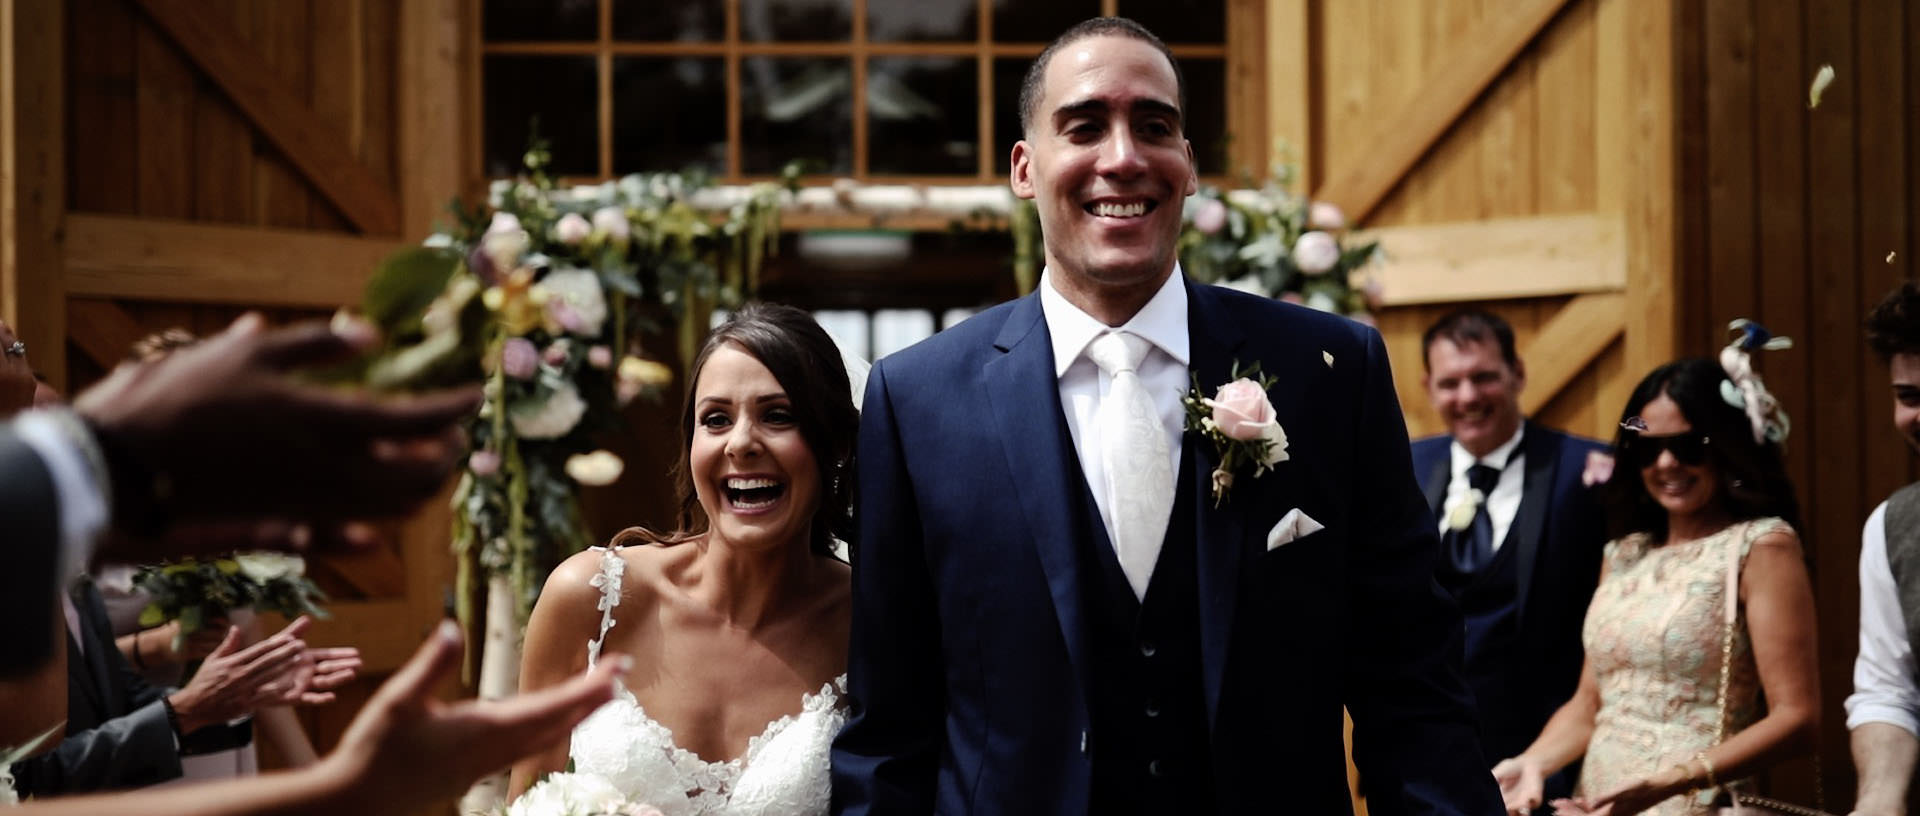 Hyde Barn Colswolds Wedding Verity-Jade & Kai 26 Cropped.jpg